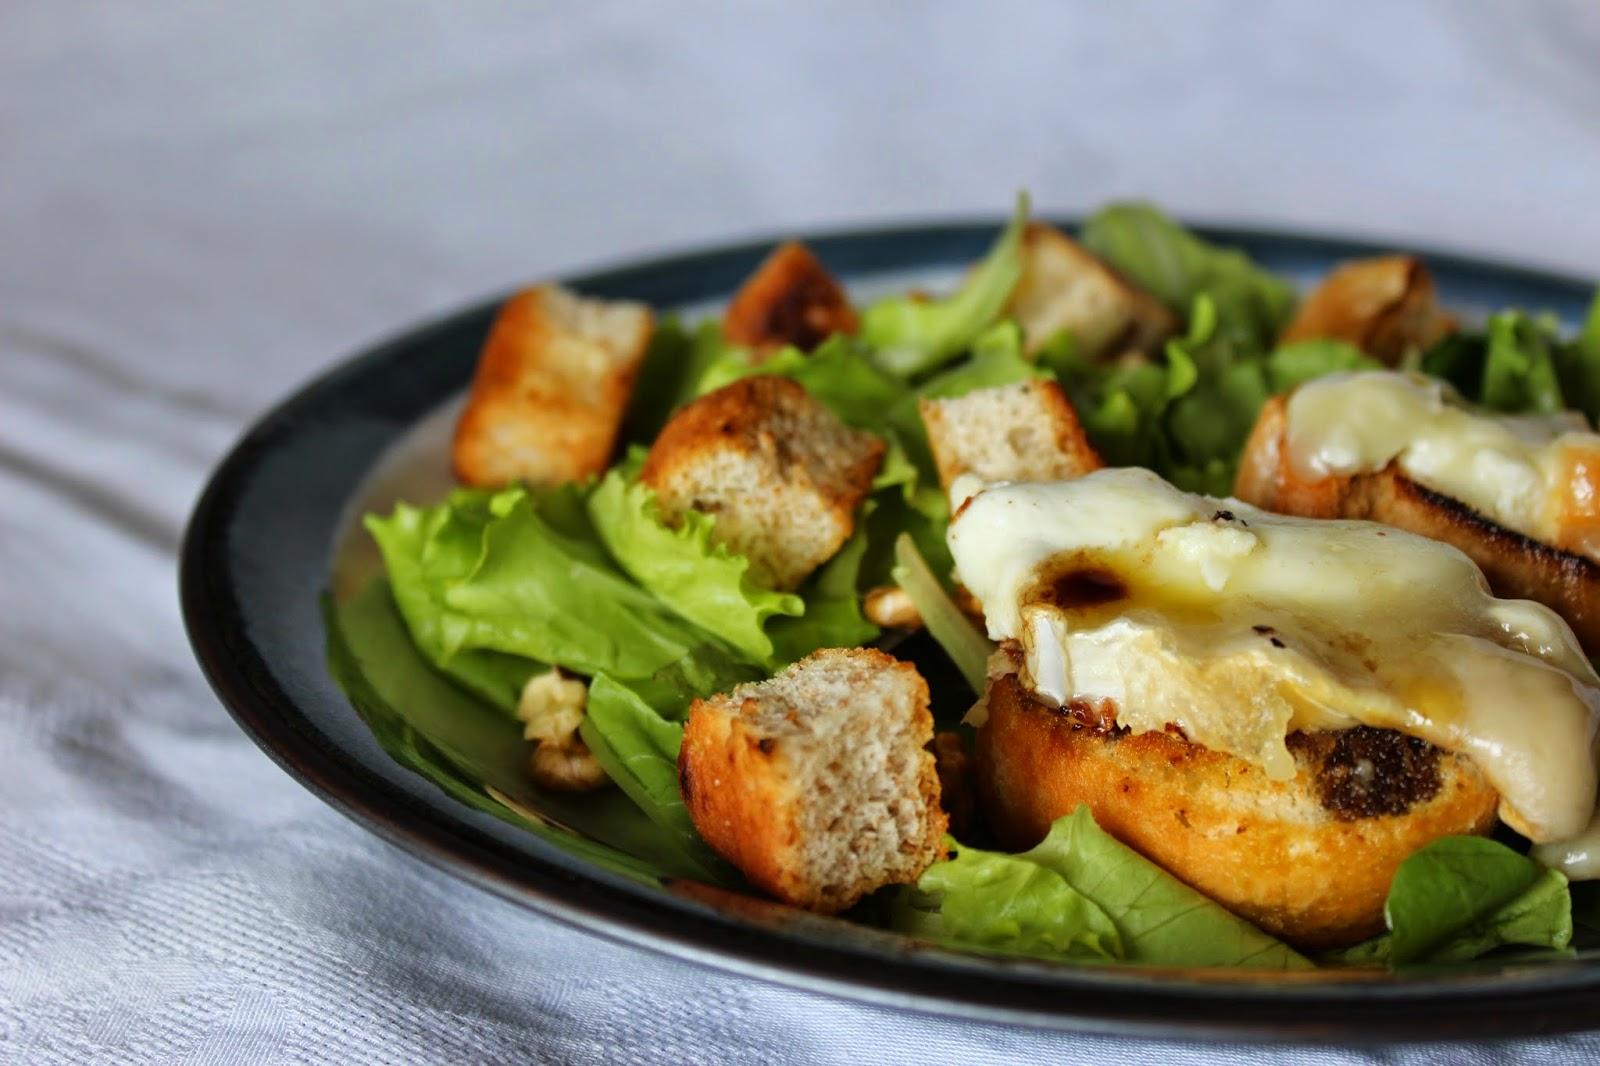 insalata francese con chèvre chaud.